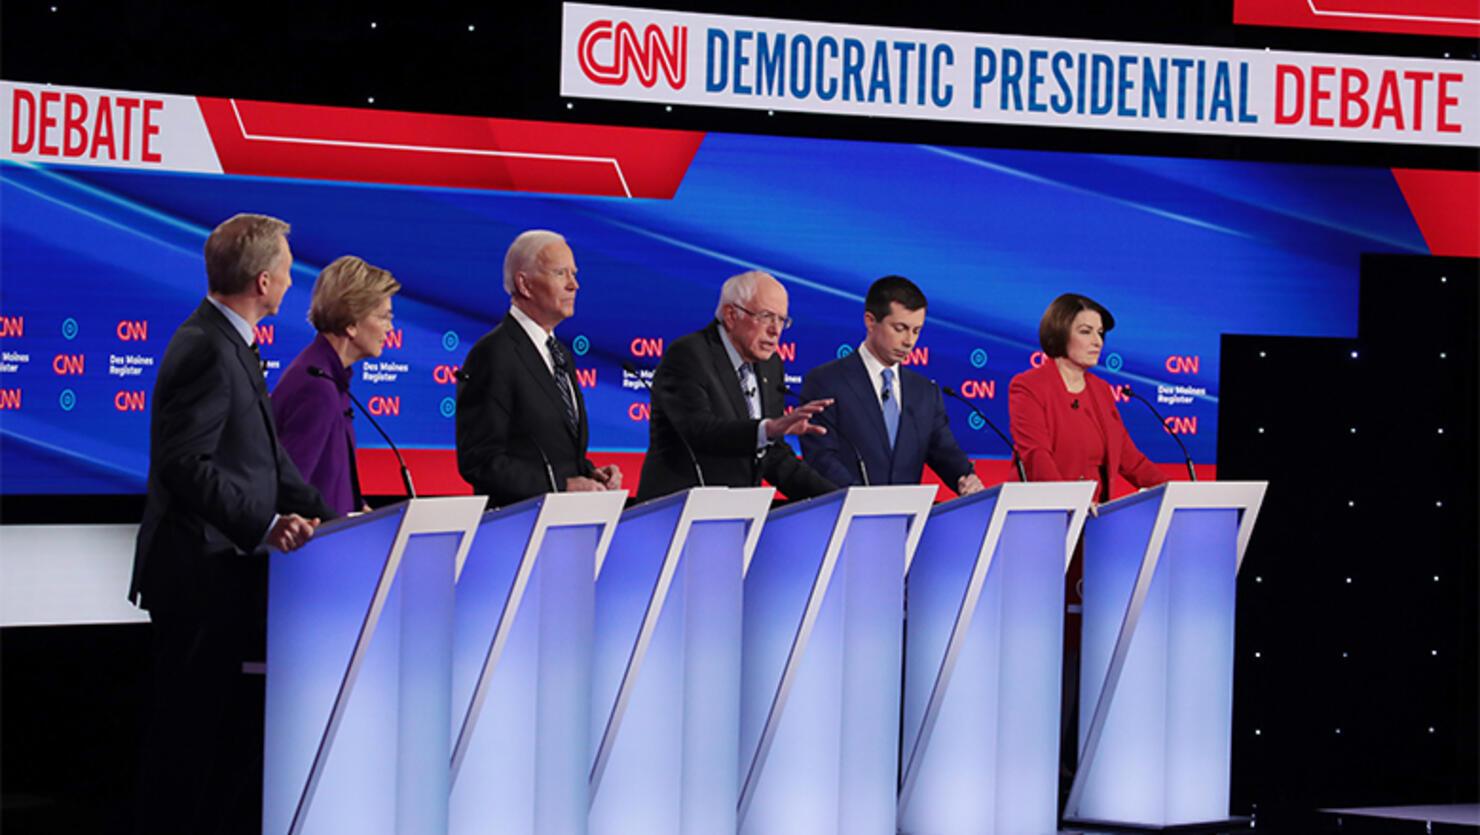 Democratic Presidential Candidates Participate In Presidential Primary Debate In Des Moines, Iowa